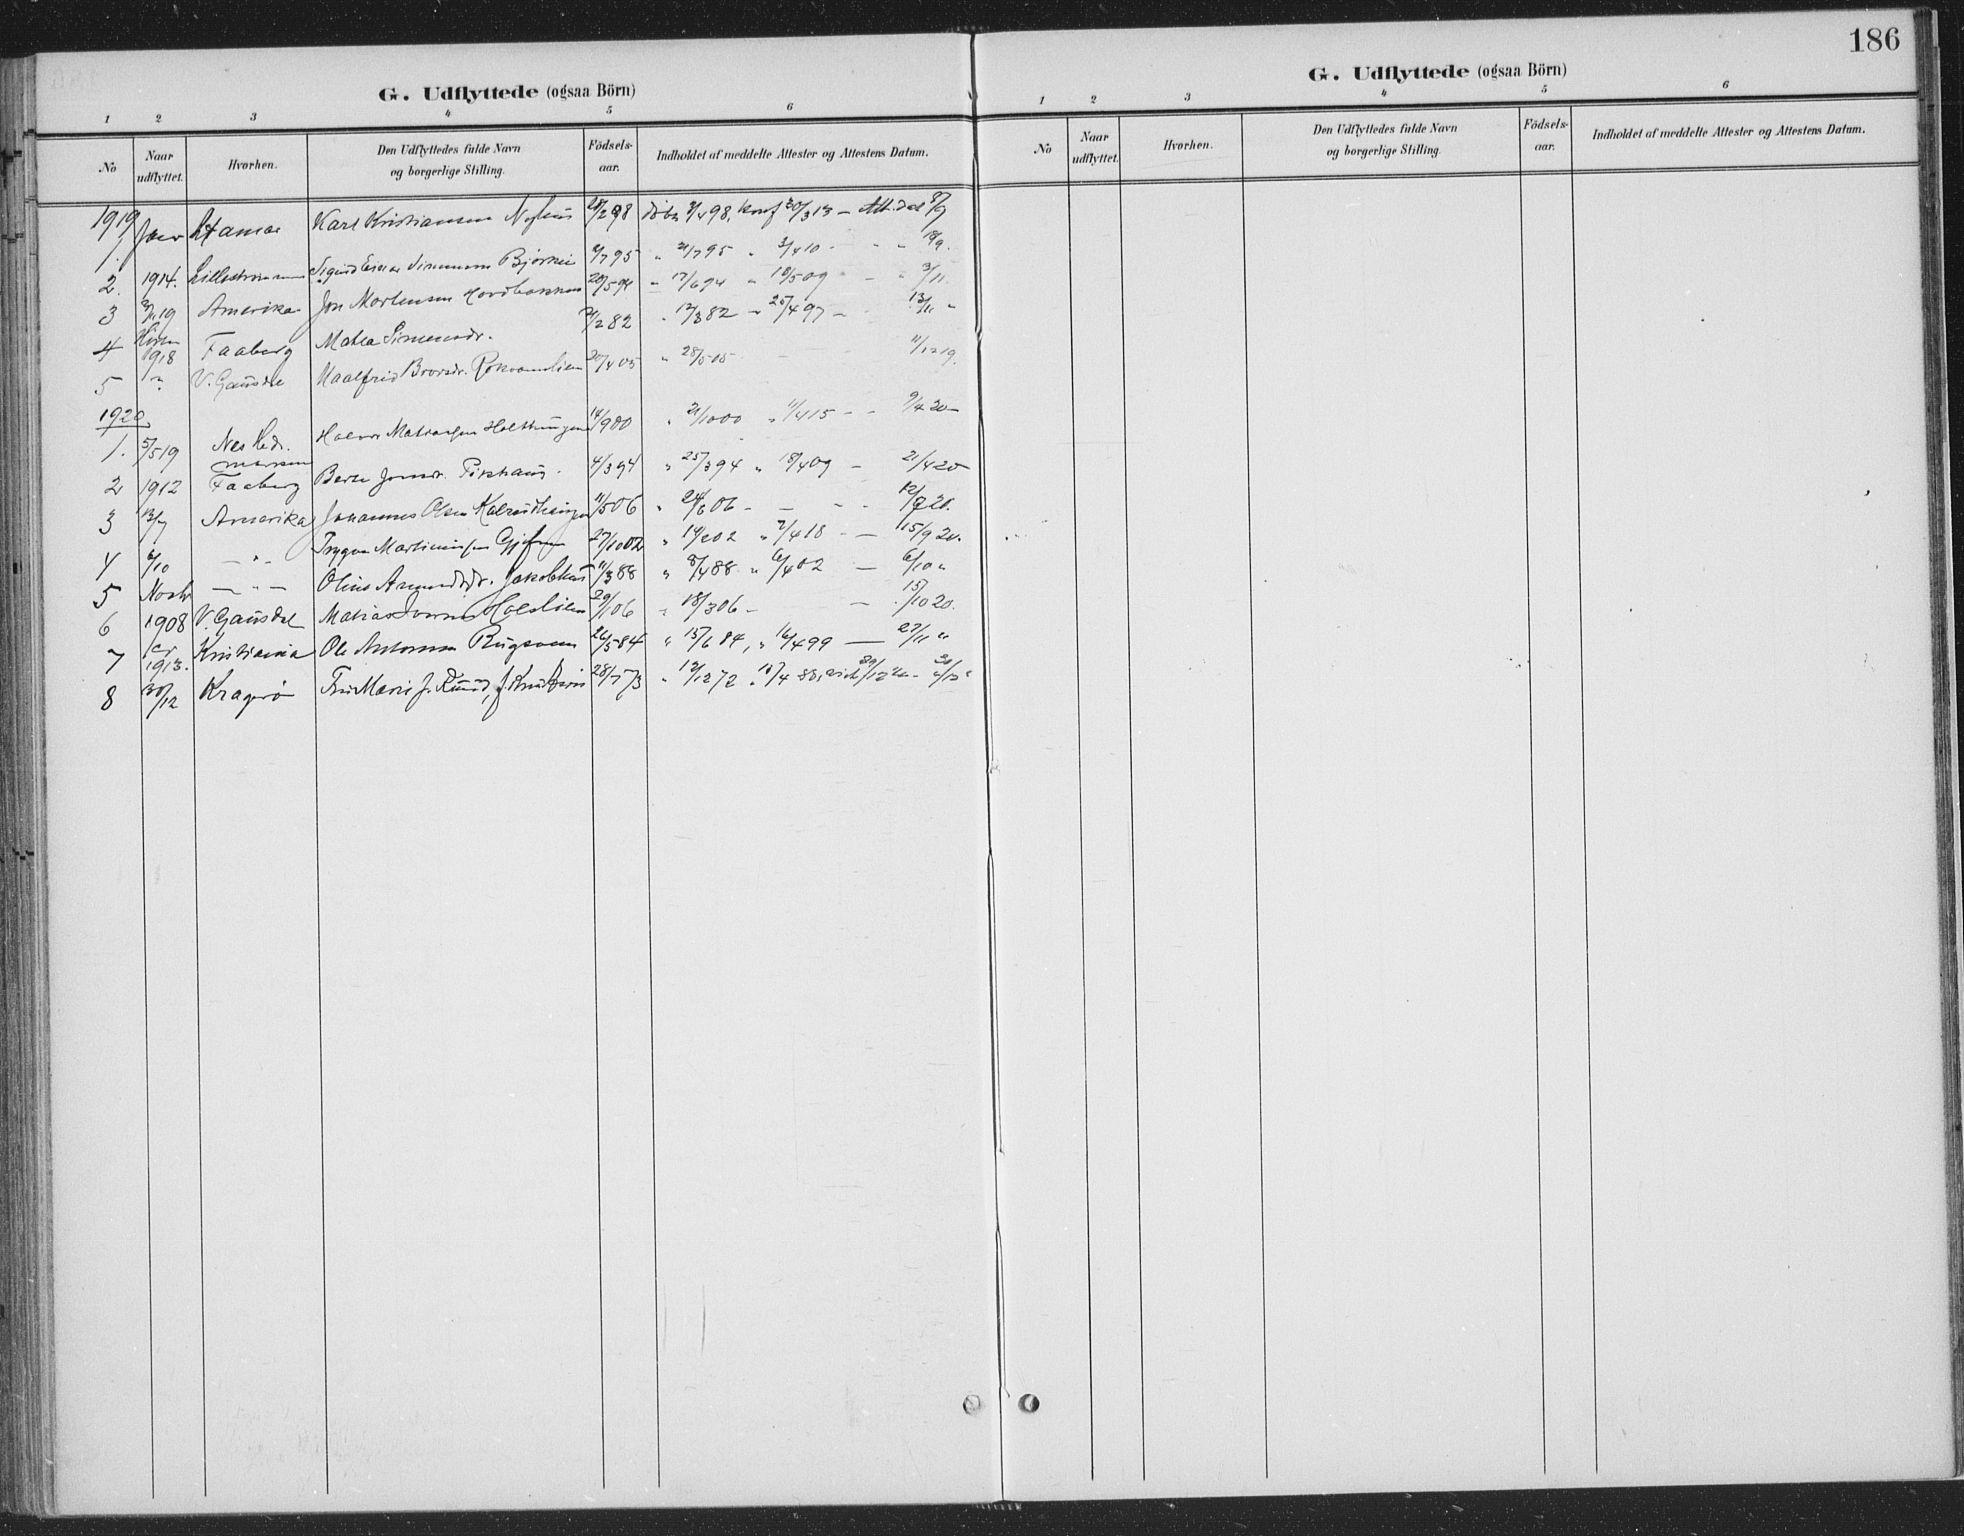 SAH, Østre Gausdal prestekontor, Ministerialbok nr. 4, 1898-1914, s. 186